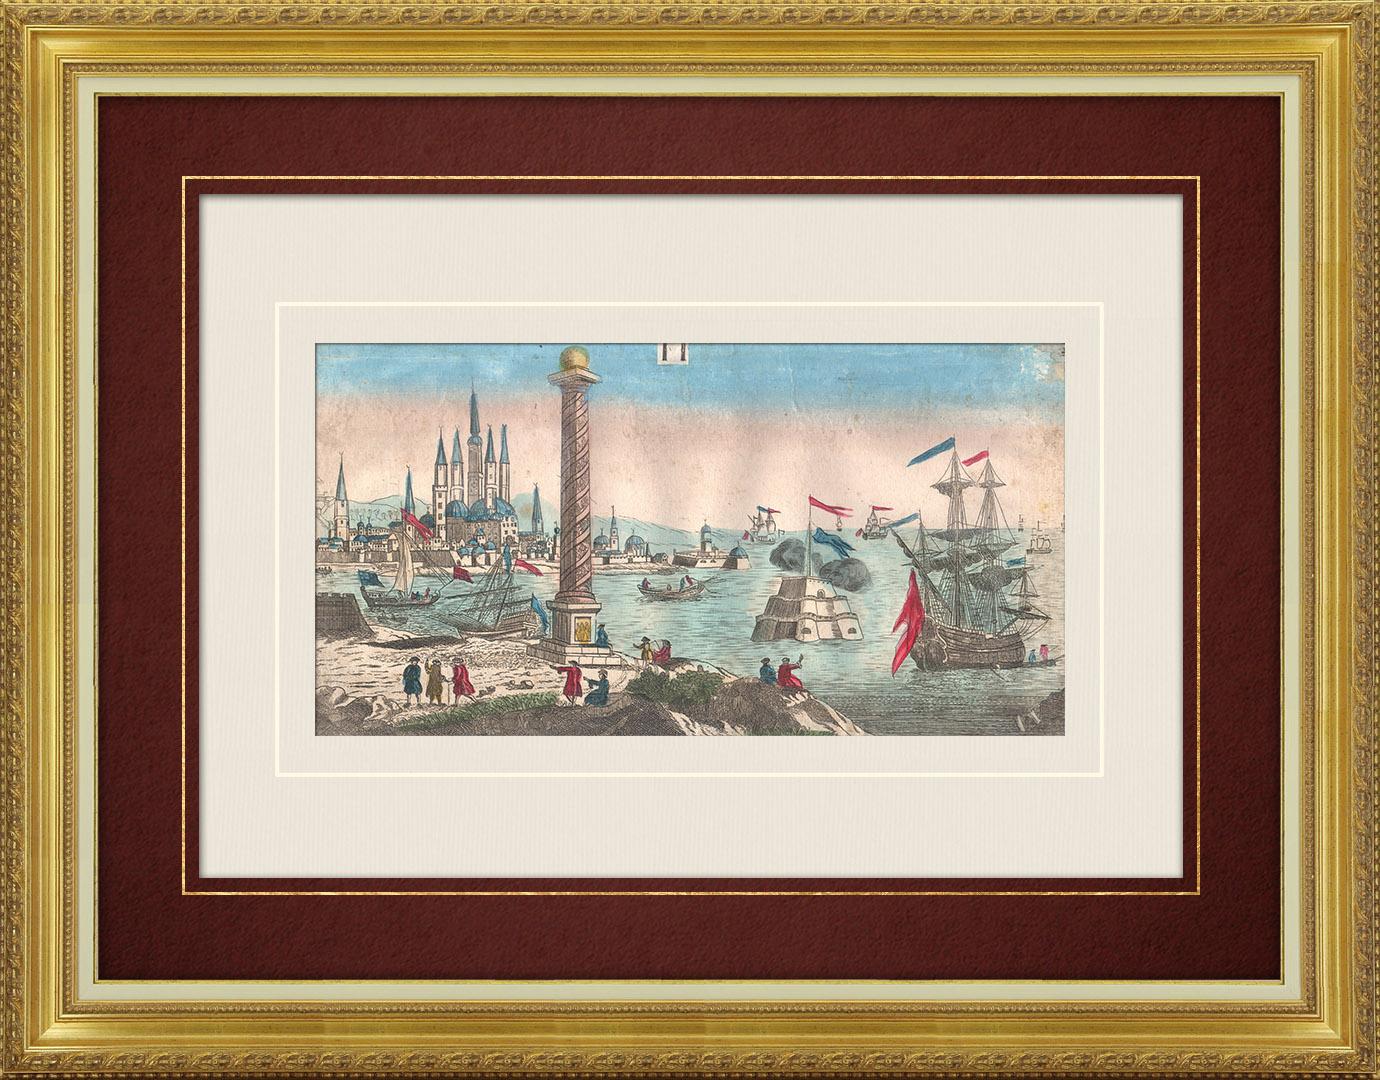 18th Century optical view in original watercolors of Alexandria (Egypt)